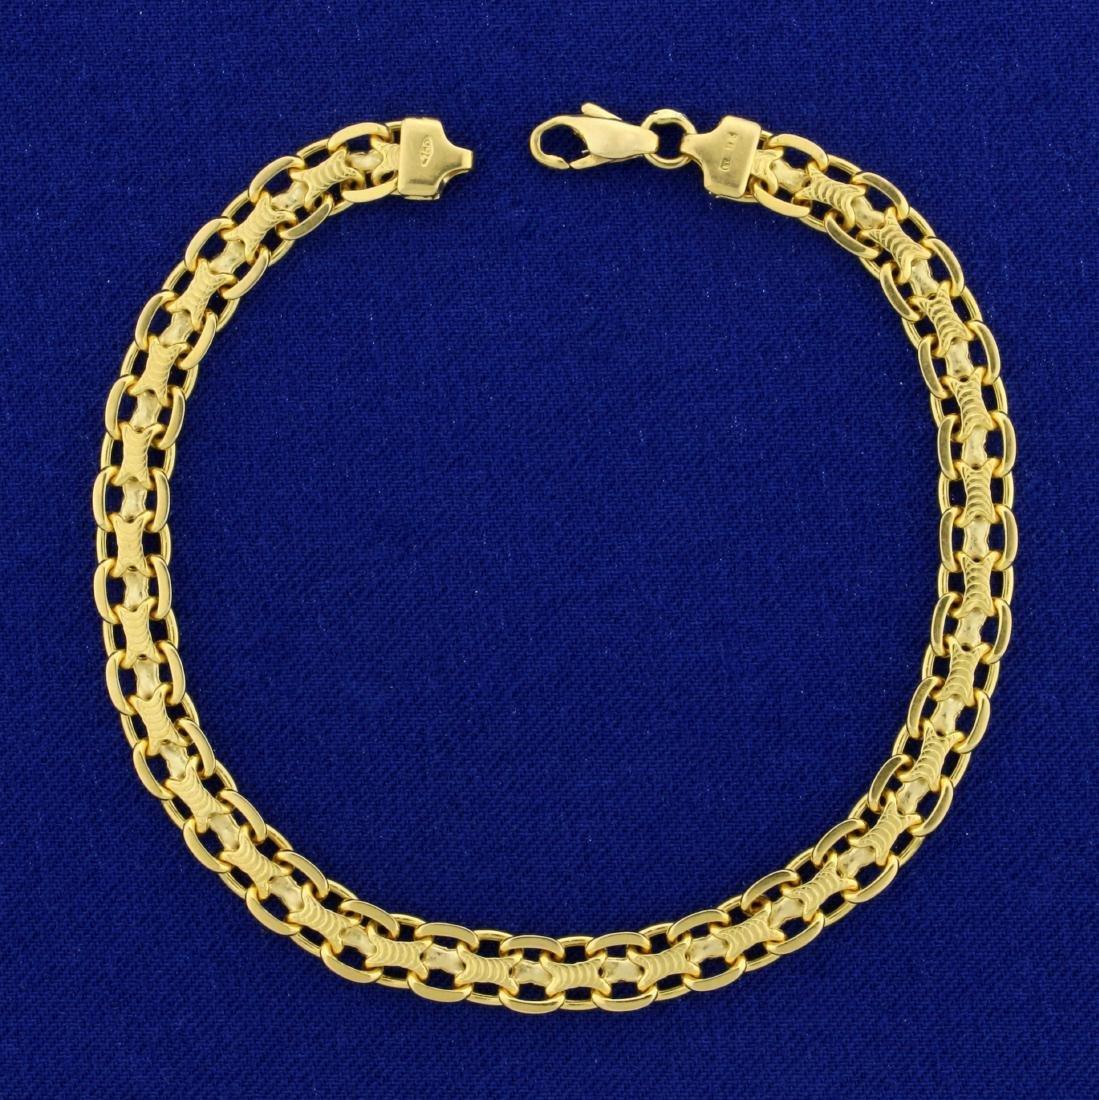 7 1/2 Inch Italian Made Designer Link Bracelet in 18K